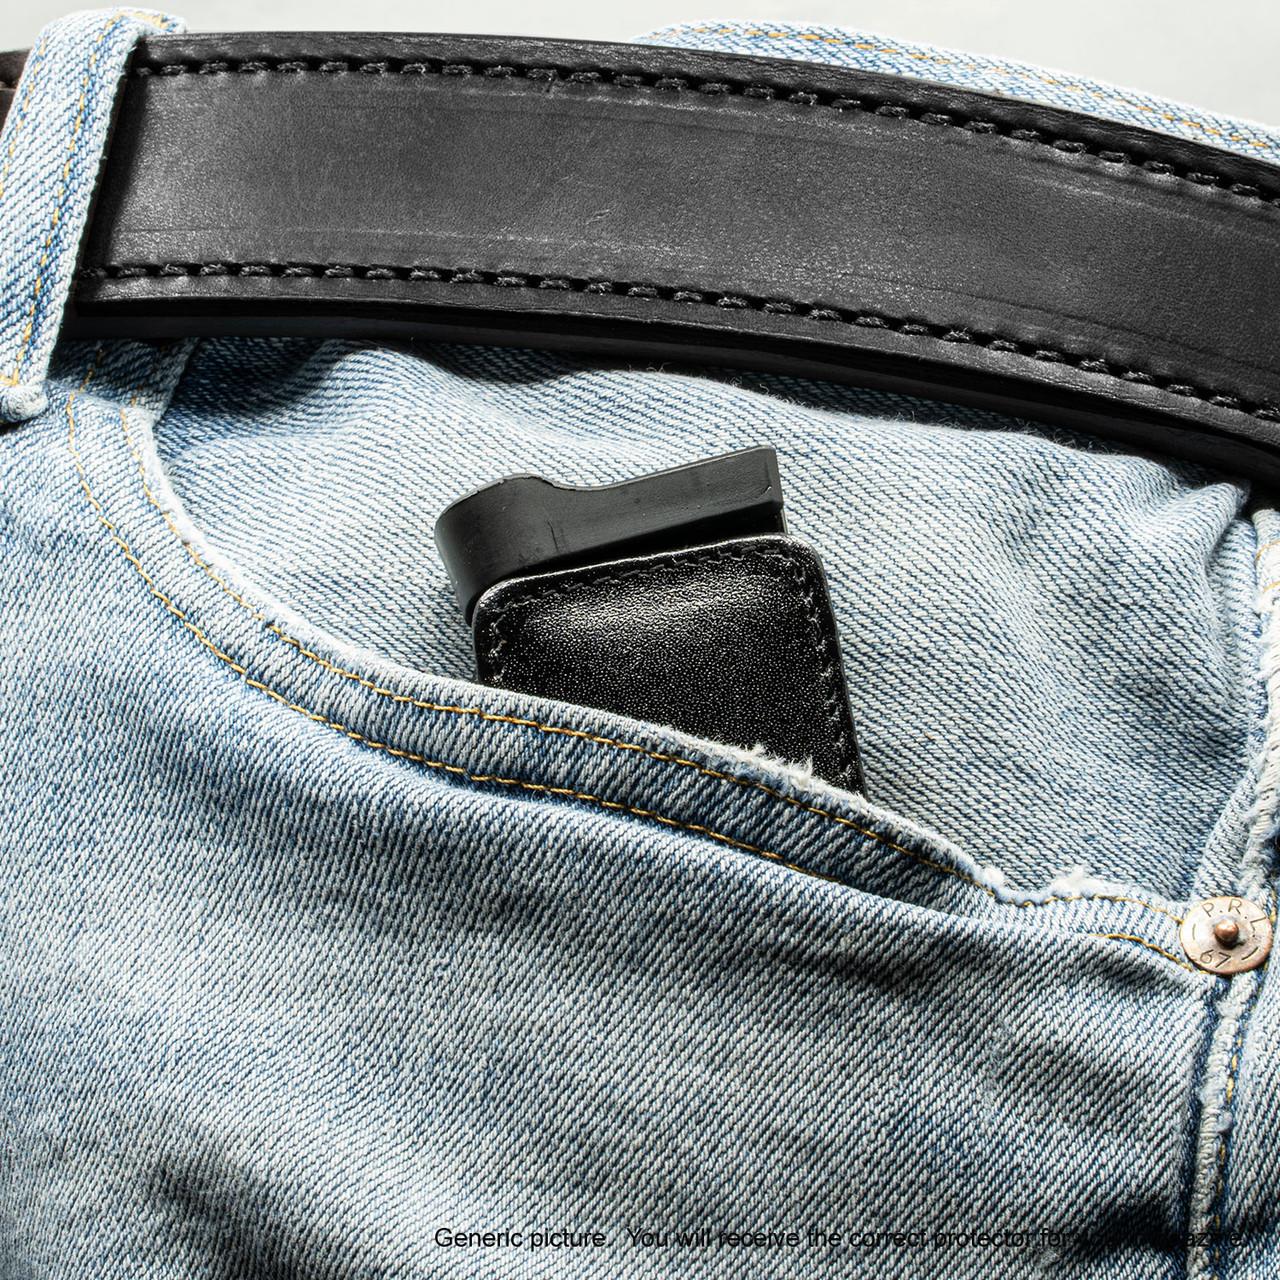 Ruger Security 9 Black Leather Magazine Pocket Protector